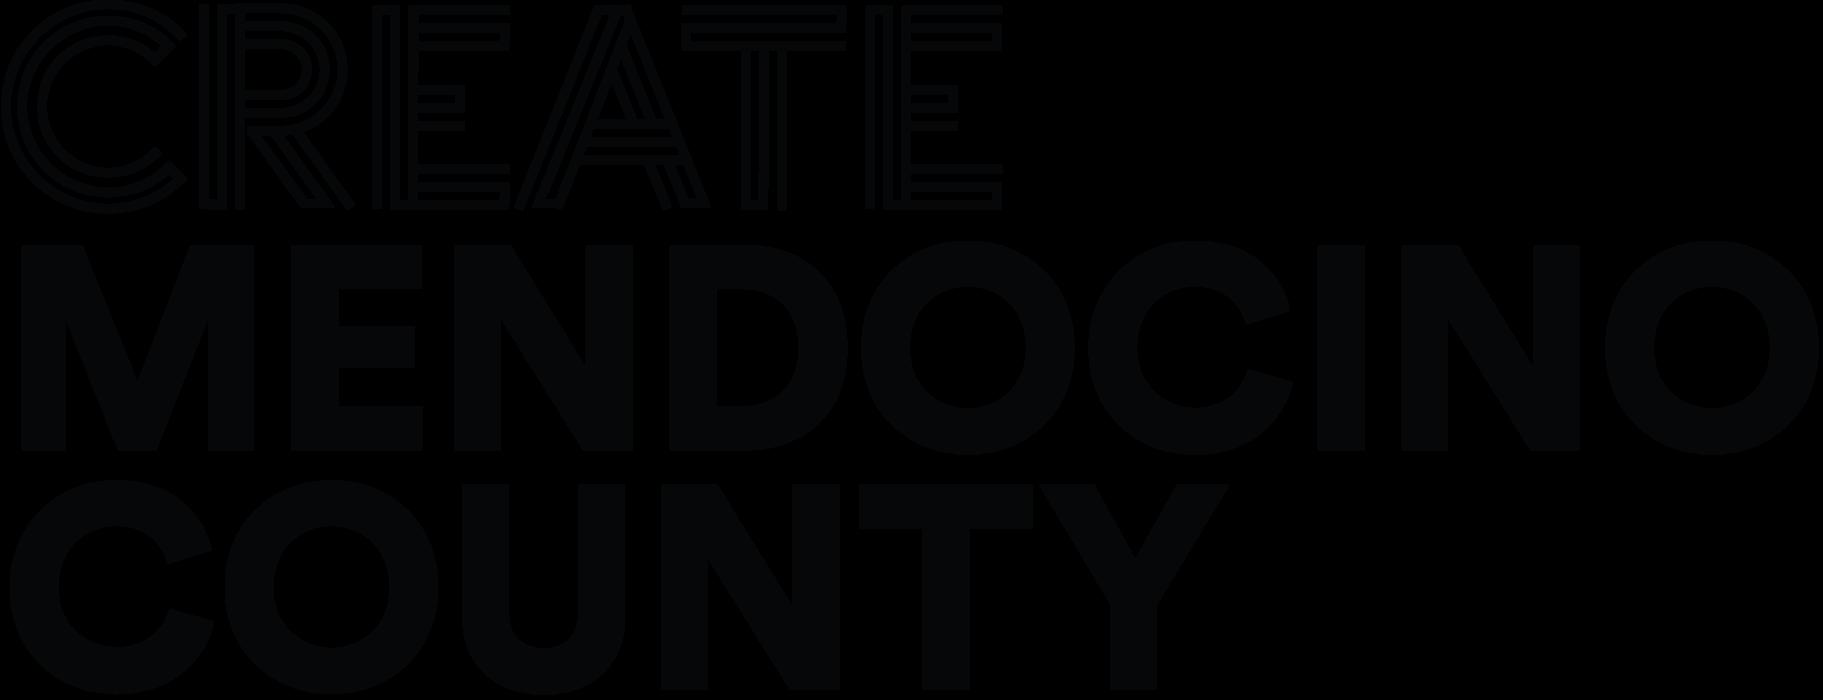 https://secureservercdn.net/198.71.233.51/mgq.552.myftpupload.com/wp-content/uploads/2020/01/Create-Ca-County-Logos-20-e1580494673603.png?time=1591126550